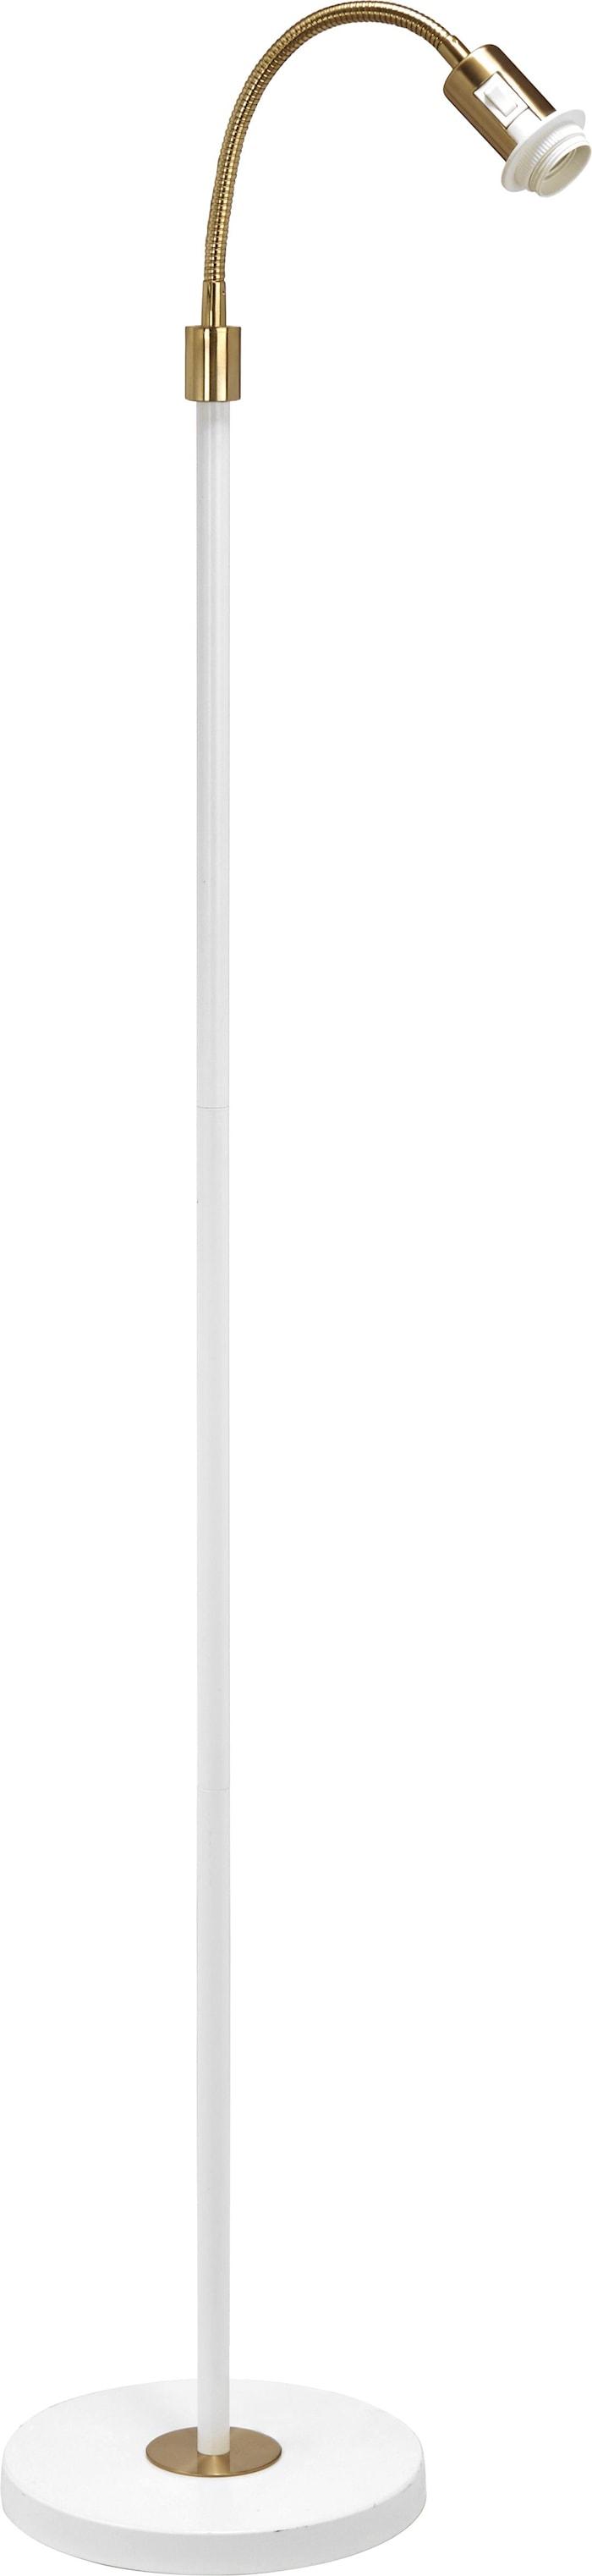 Gulvfot 1A Cia 160 cm